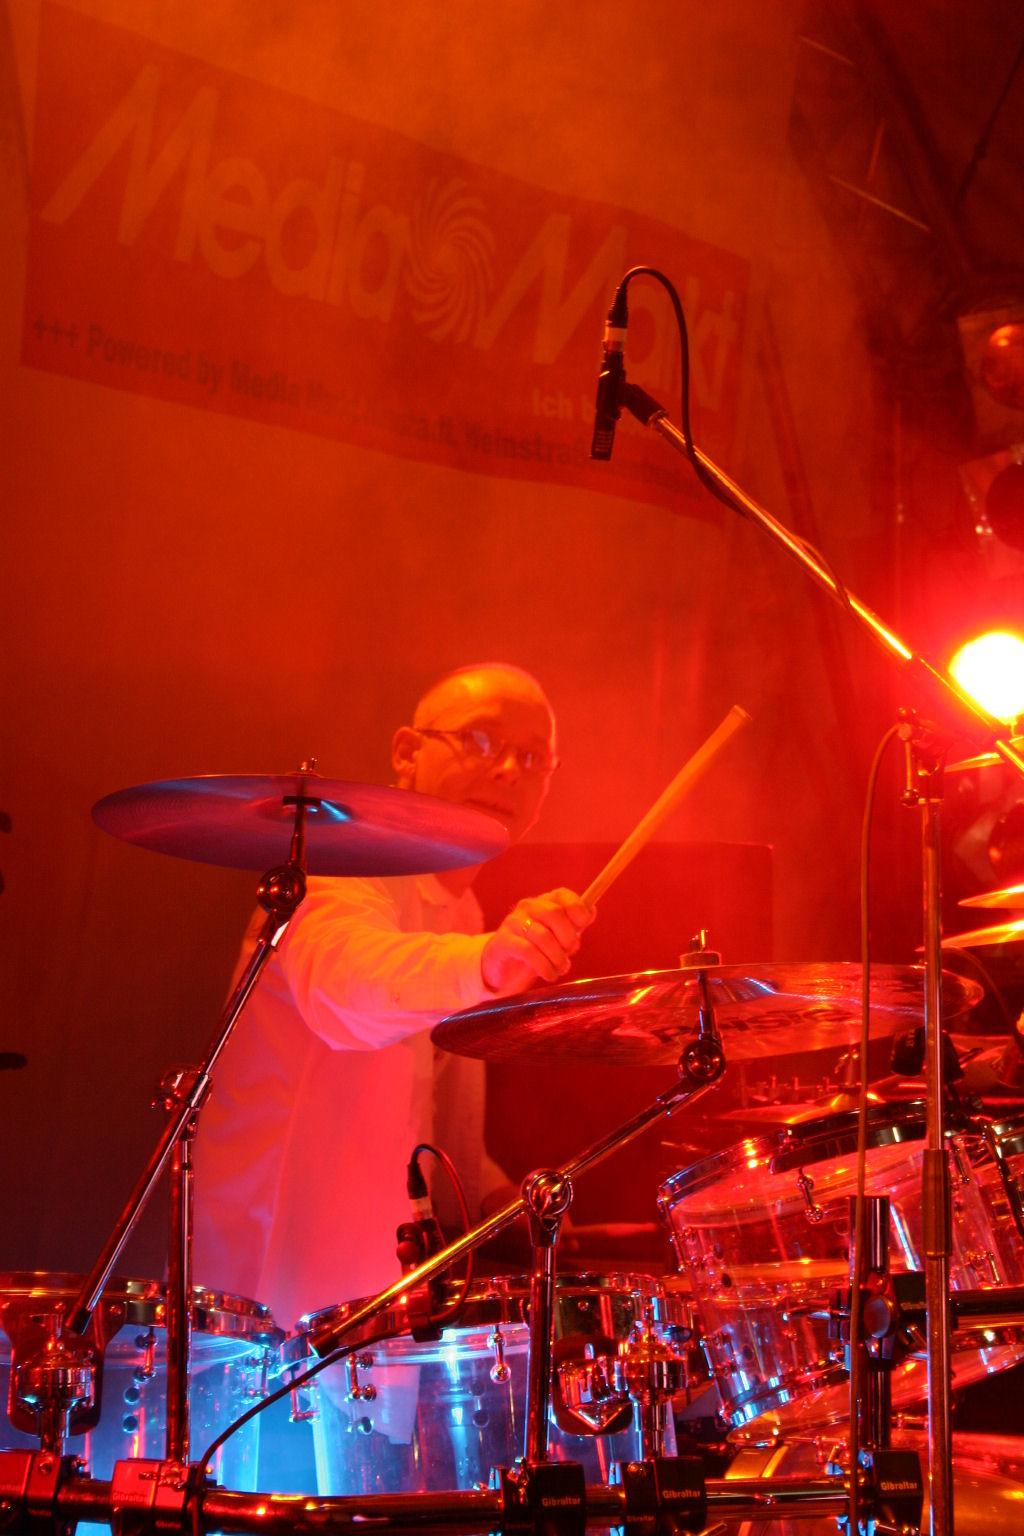 Johannes Gerster on WAHAN drums